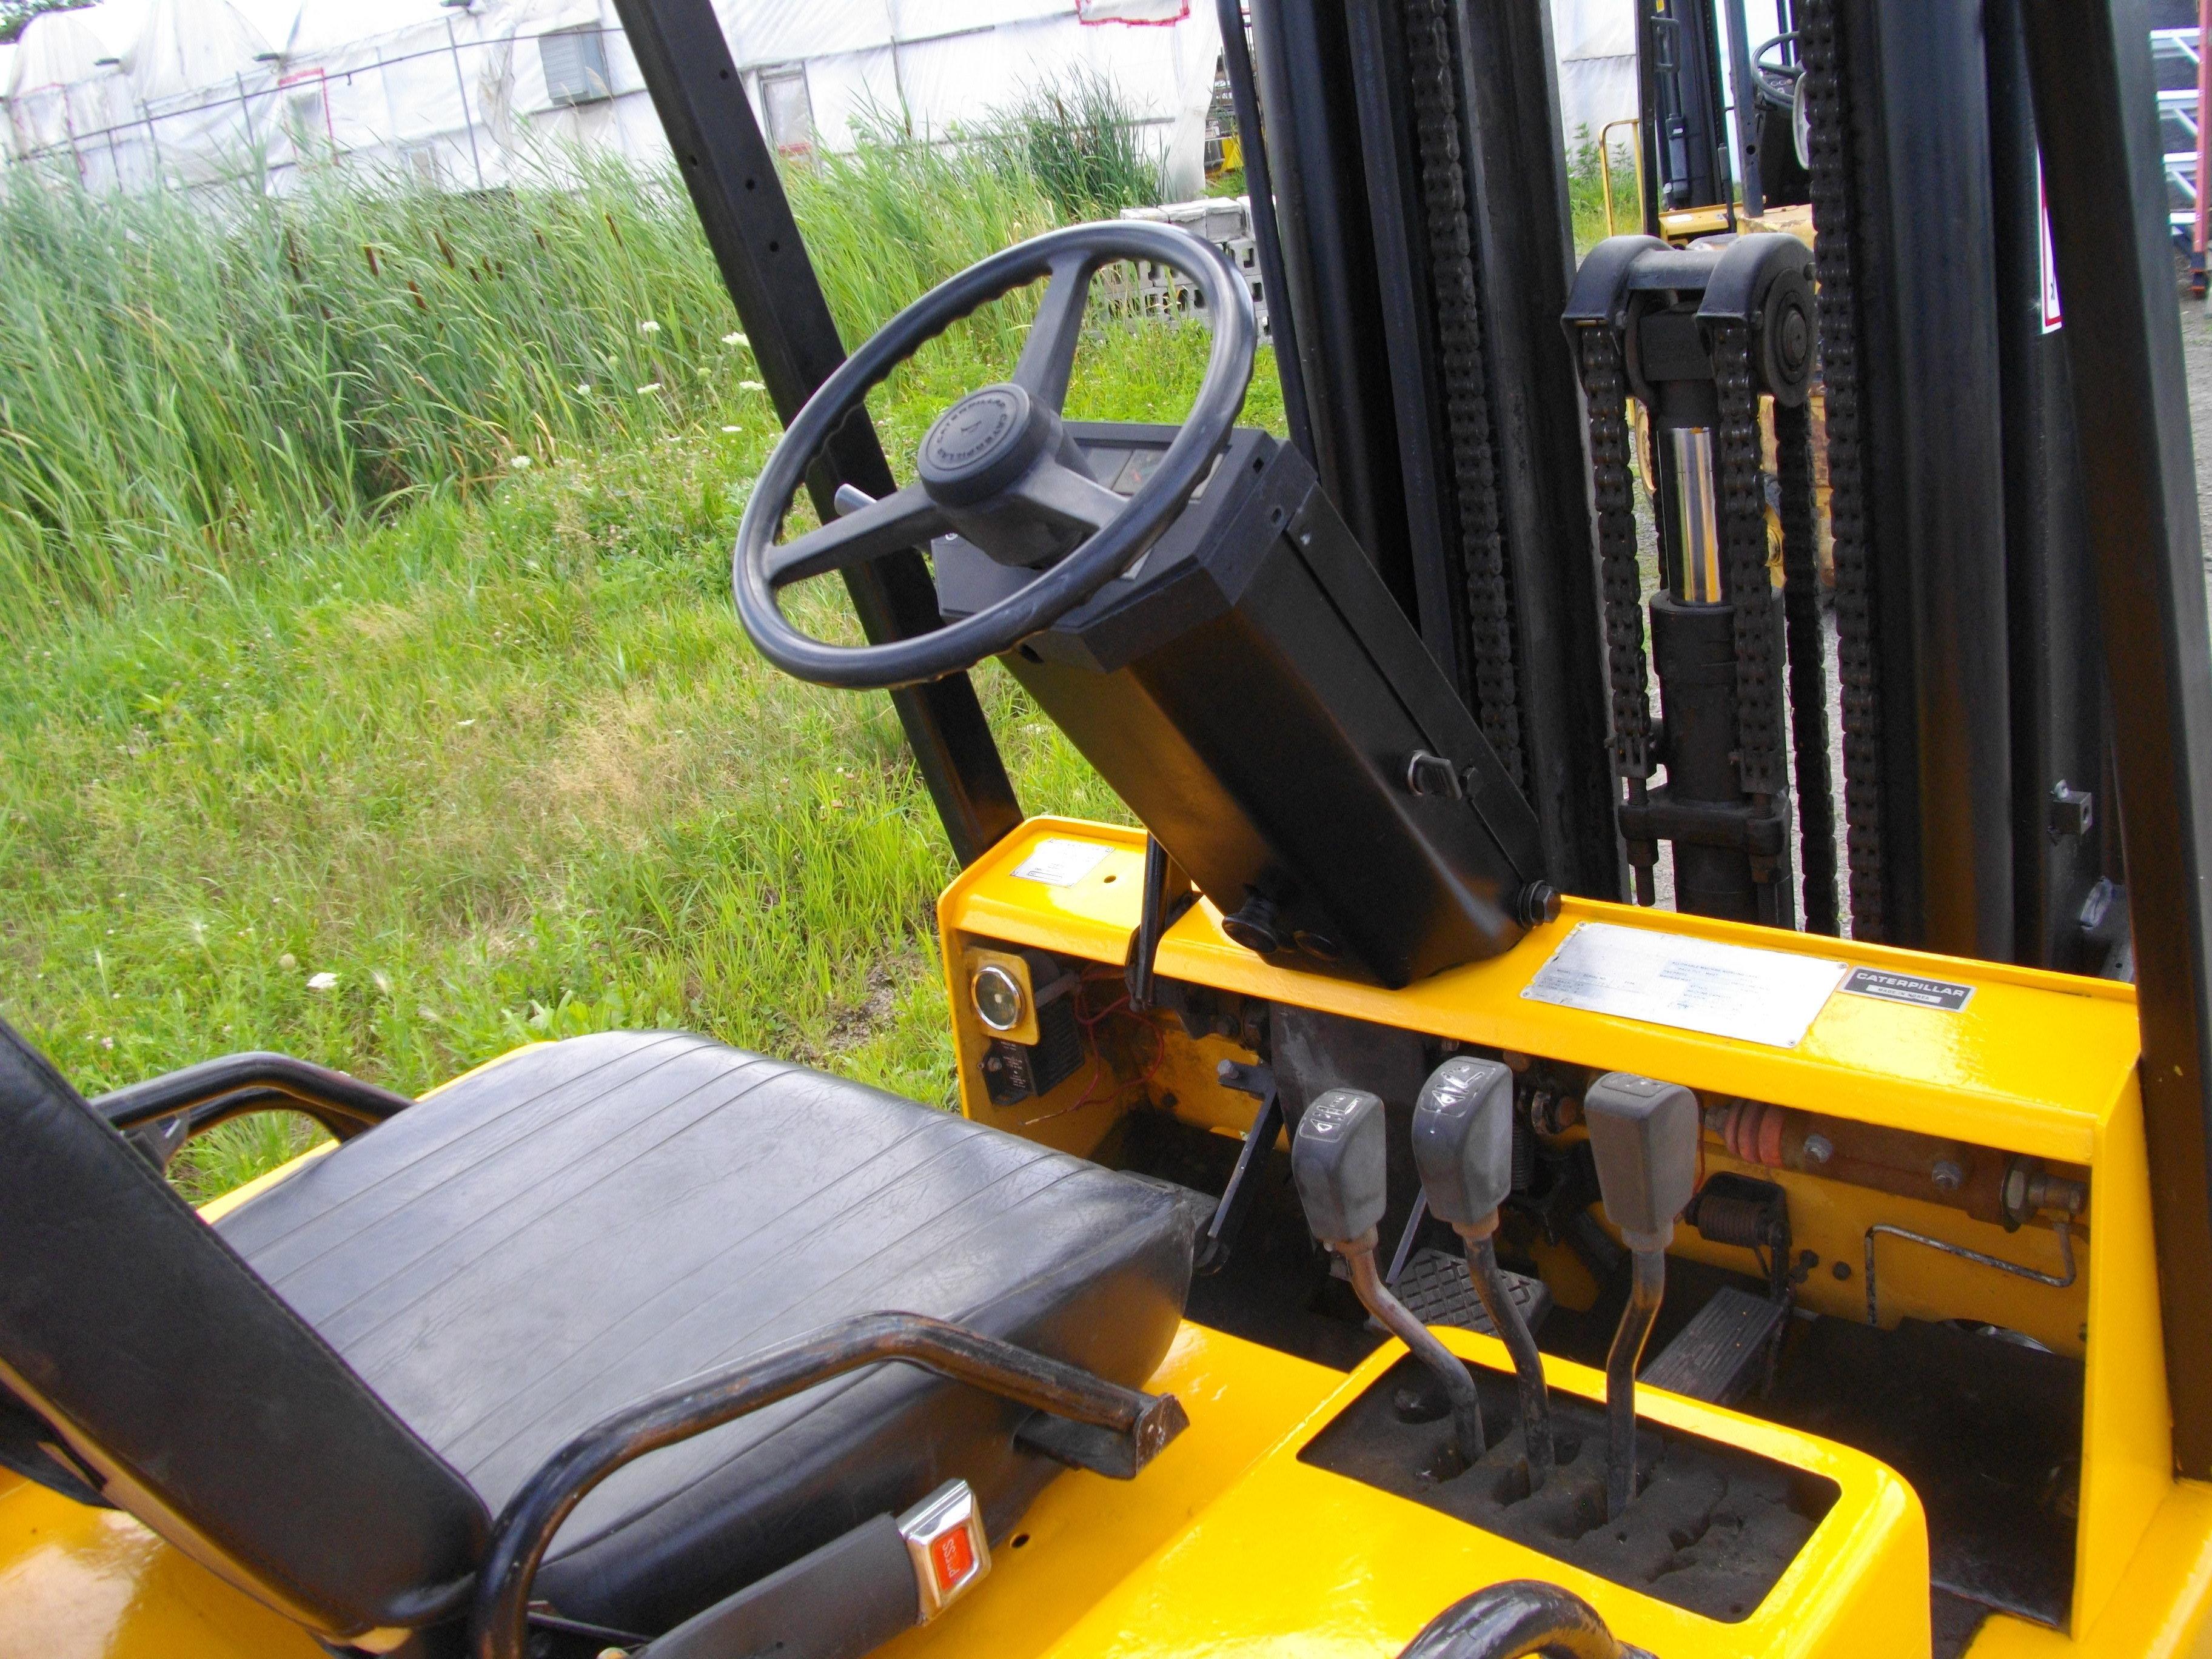 Caterpillar Forklift Model Numbers